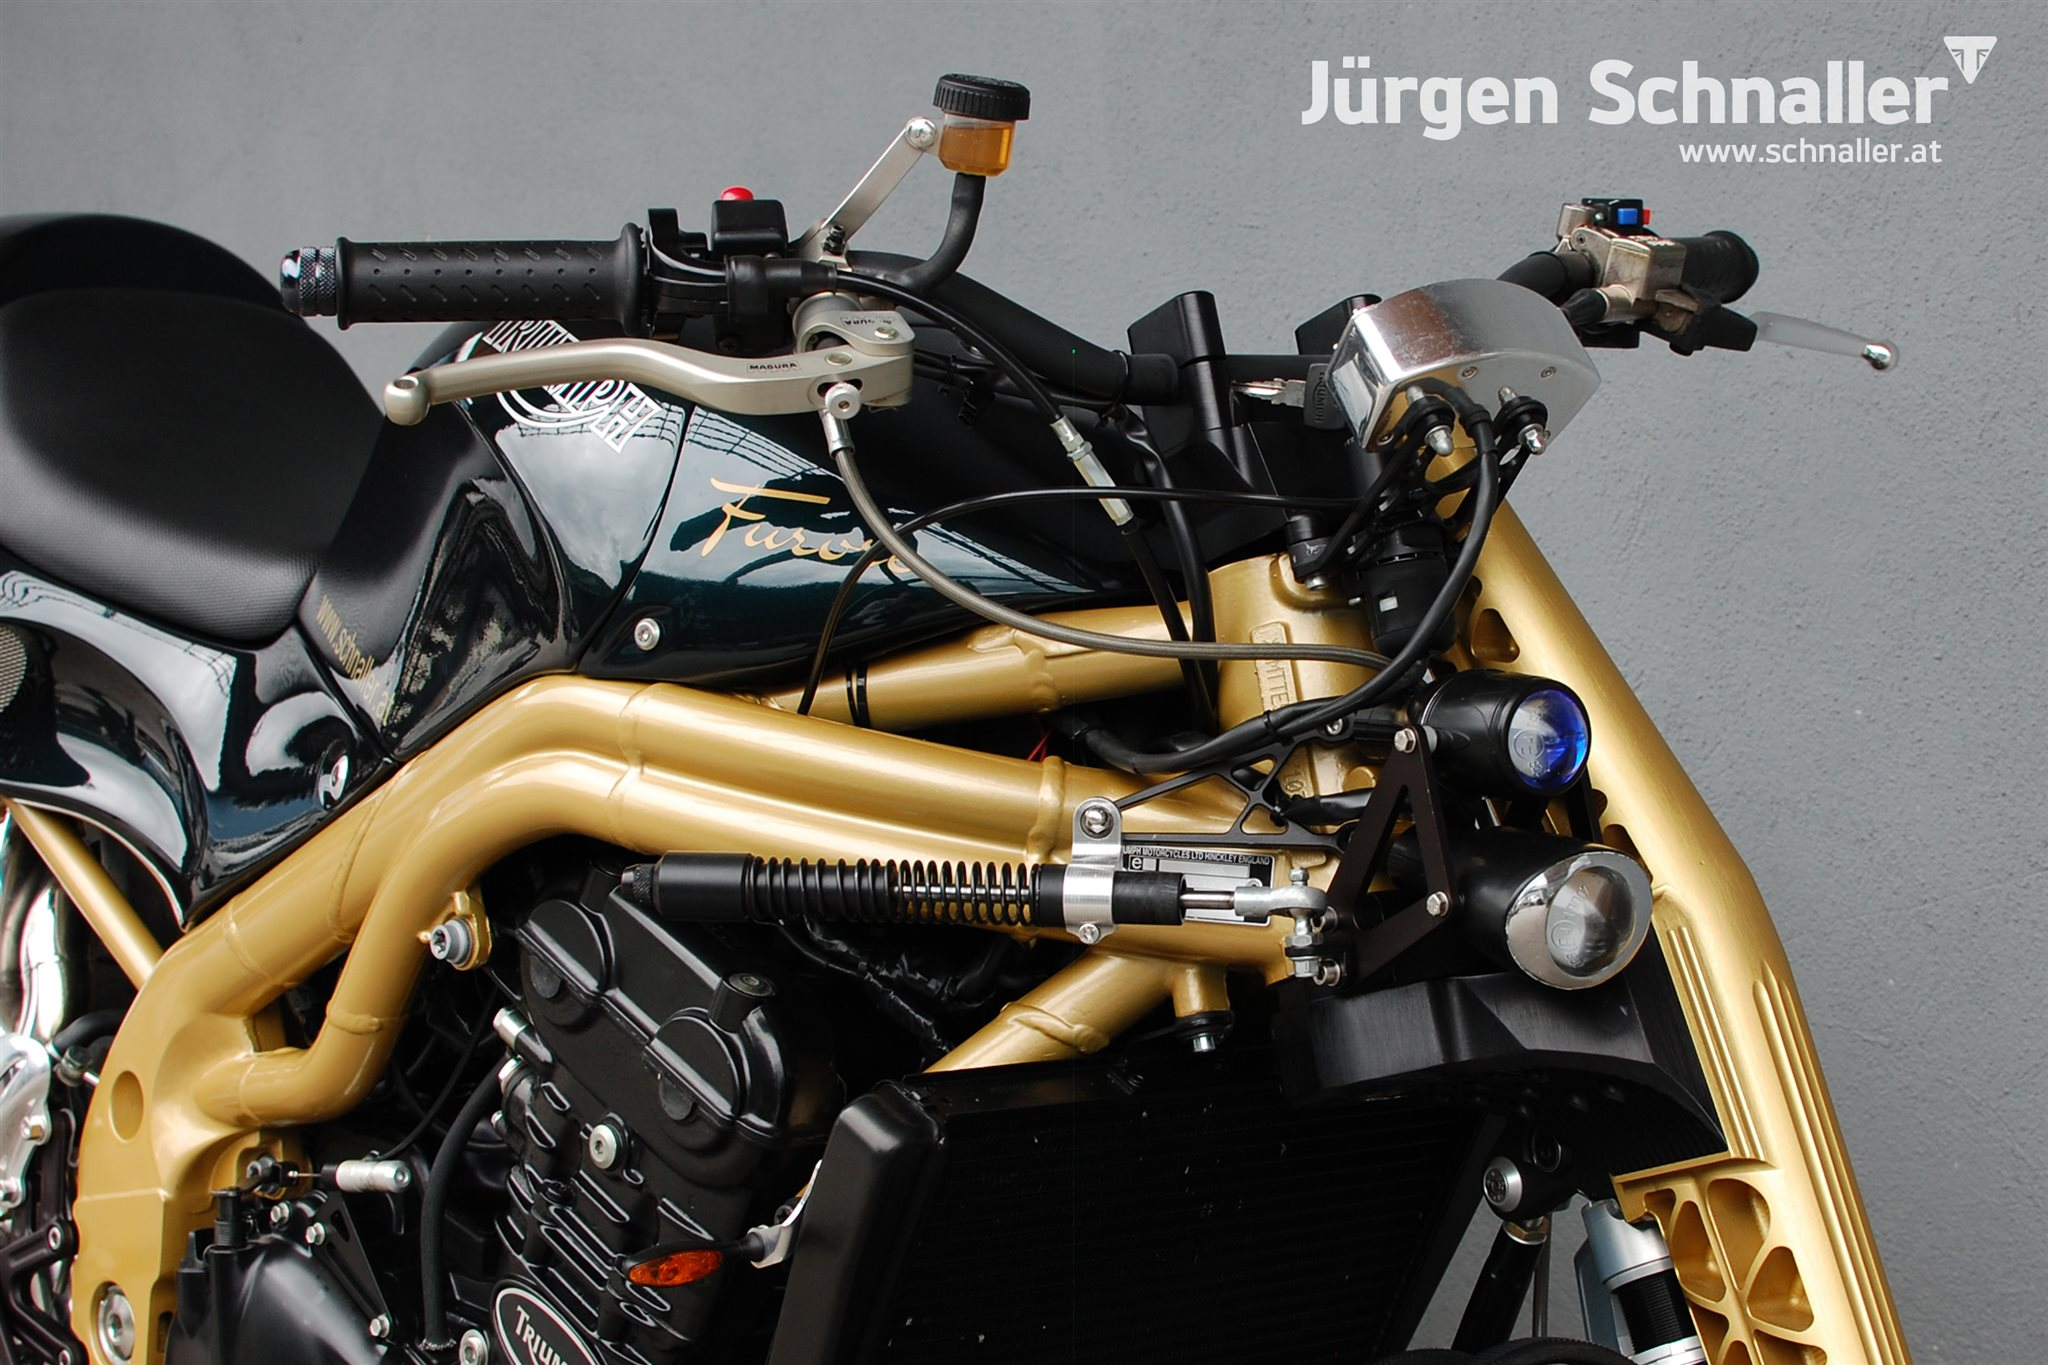 umgebautes motorrad triumph speed triple 955i von j rgen. Black Bedroom Furniture Sets. Home Design Ideas